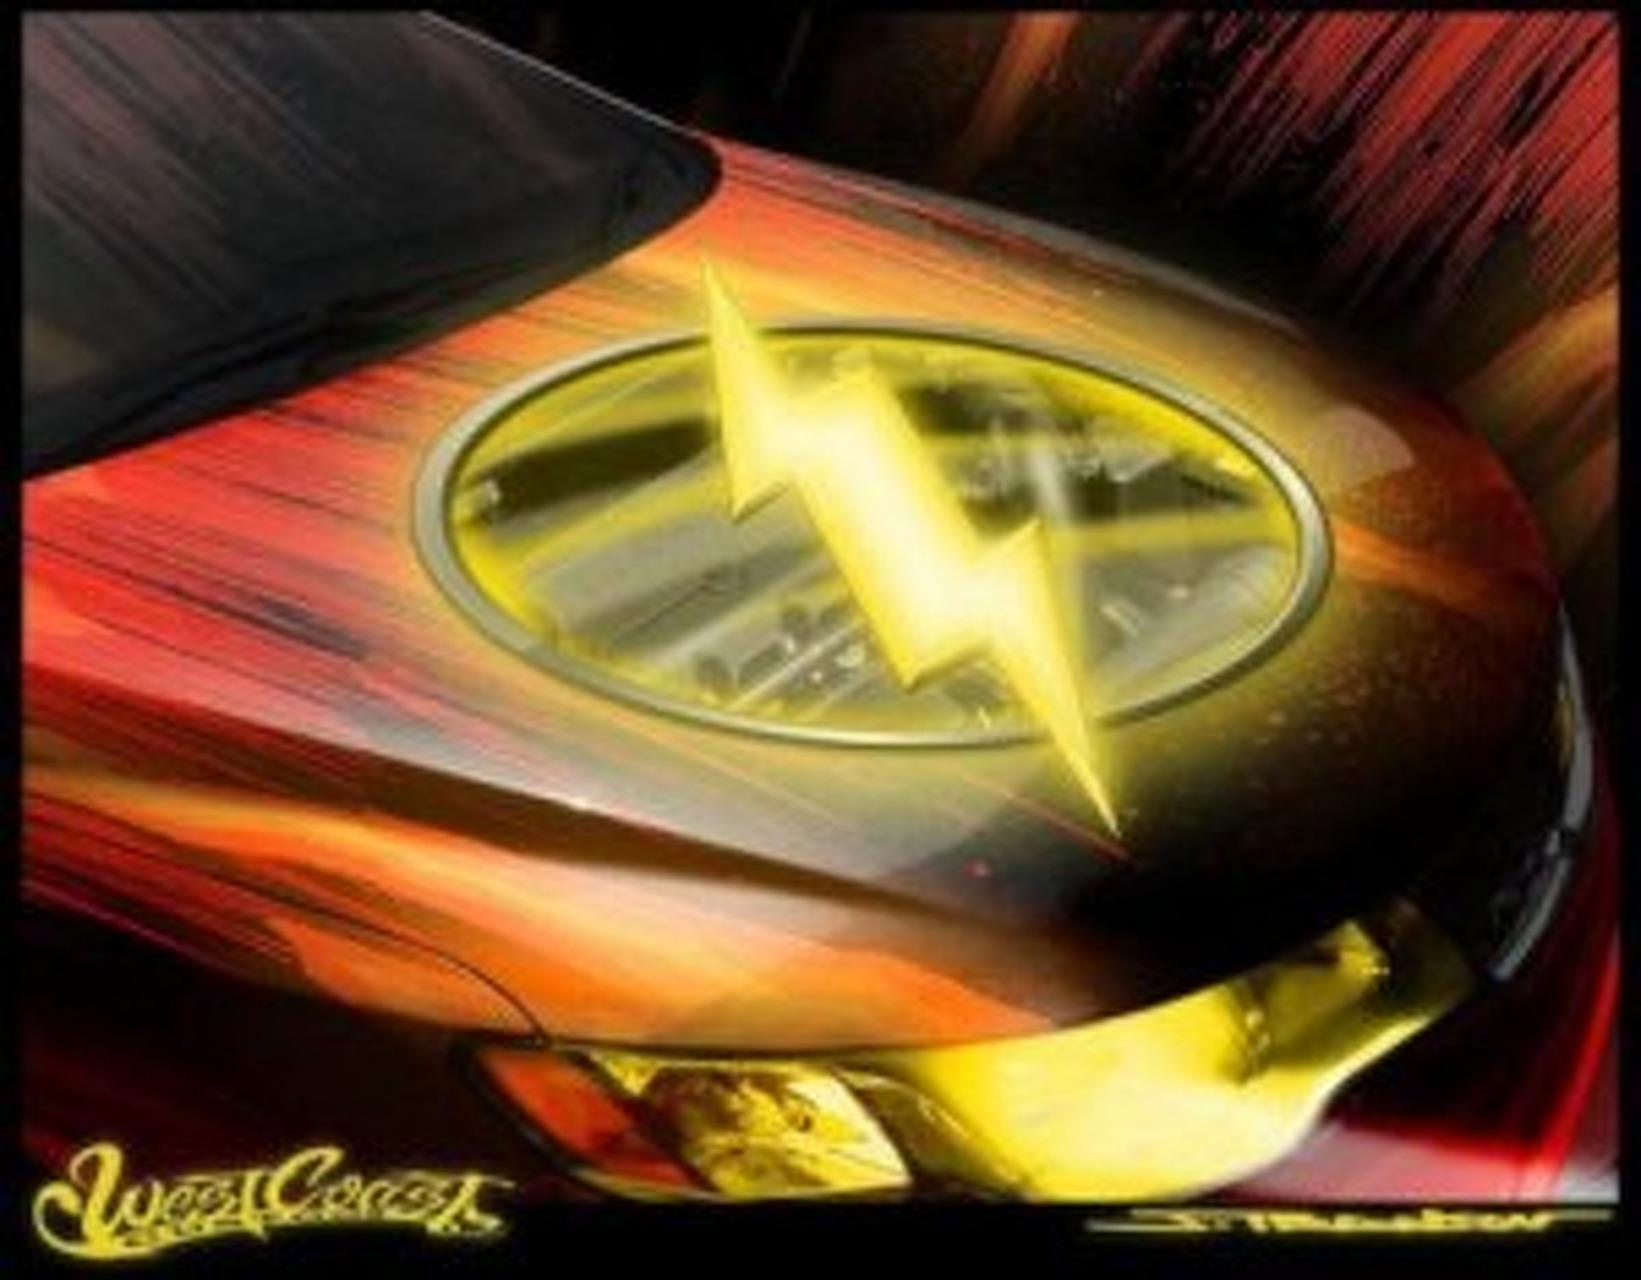 Kia Teams Up With DC Comics for Three Superhero Inspired Rides